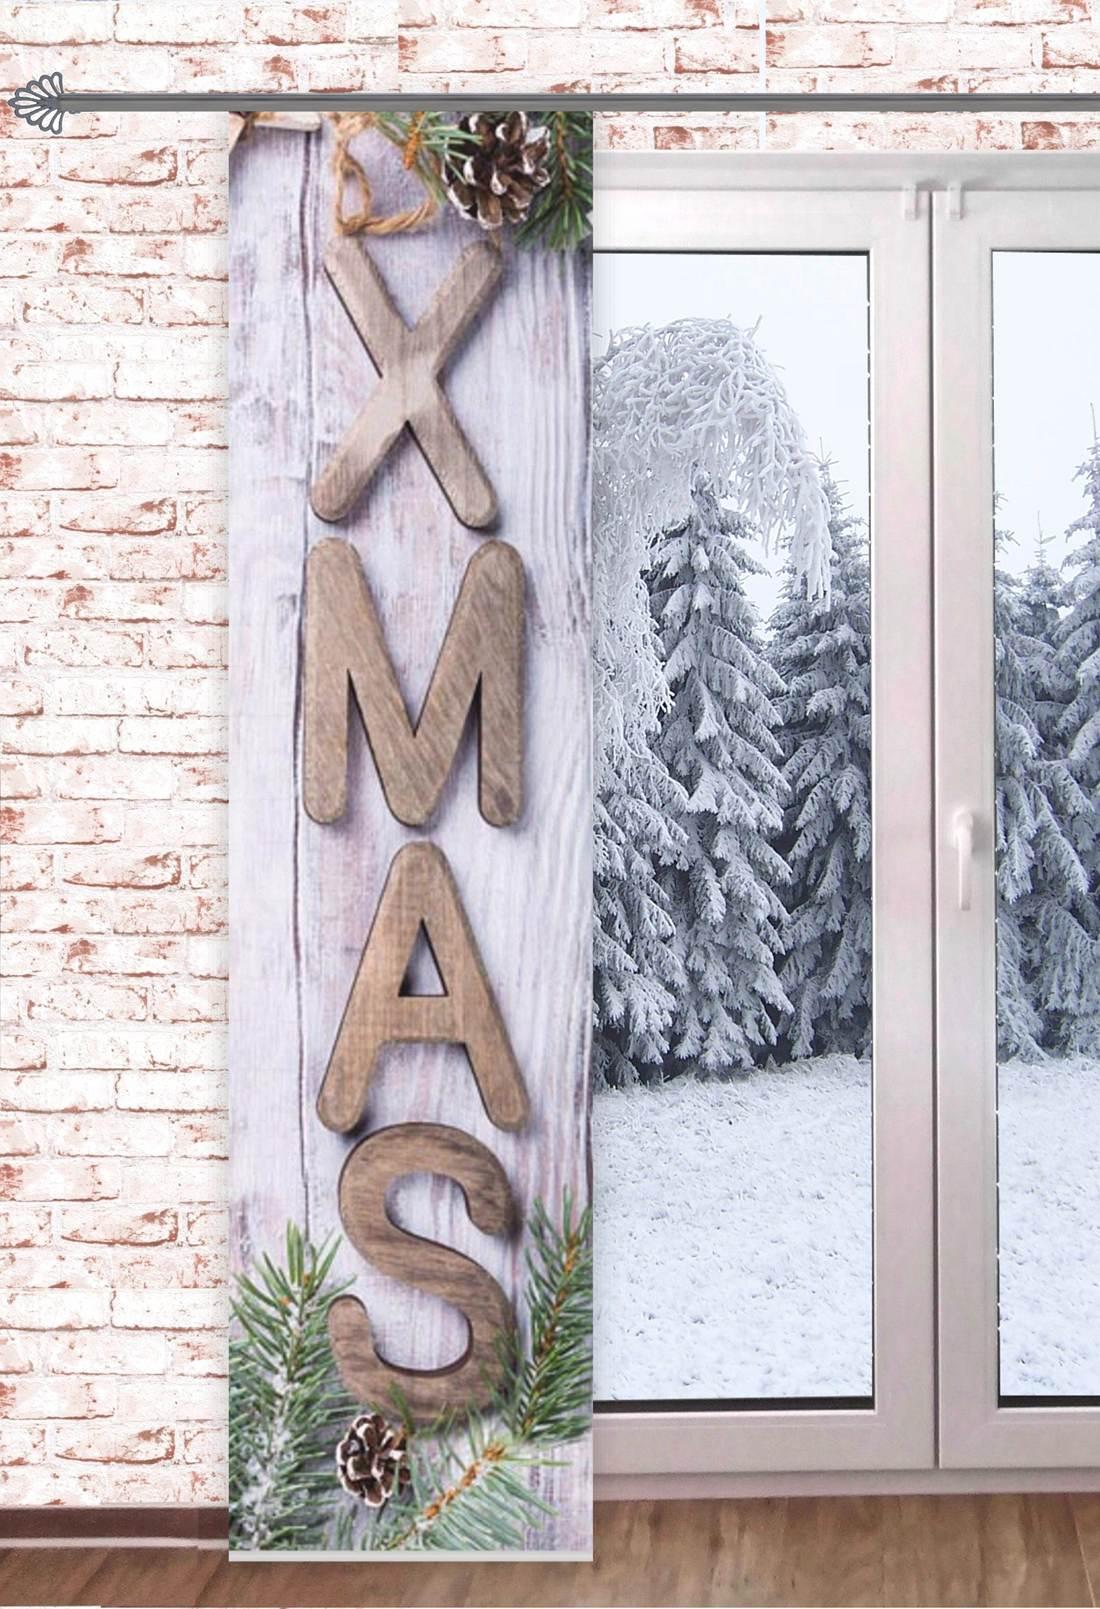 Gardinen Weihnachten.Gardinen Welt Online Shop Schiebevorhang Merry Xmas 60x245cm